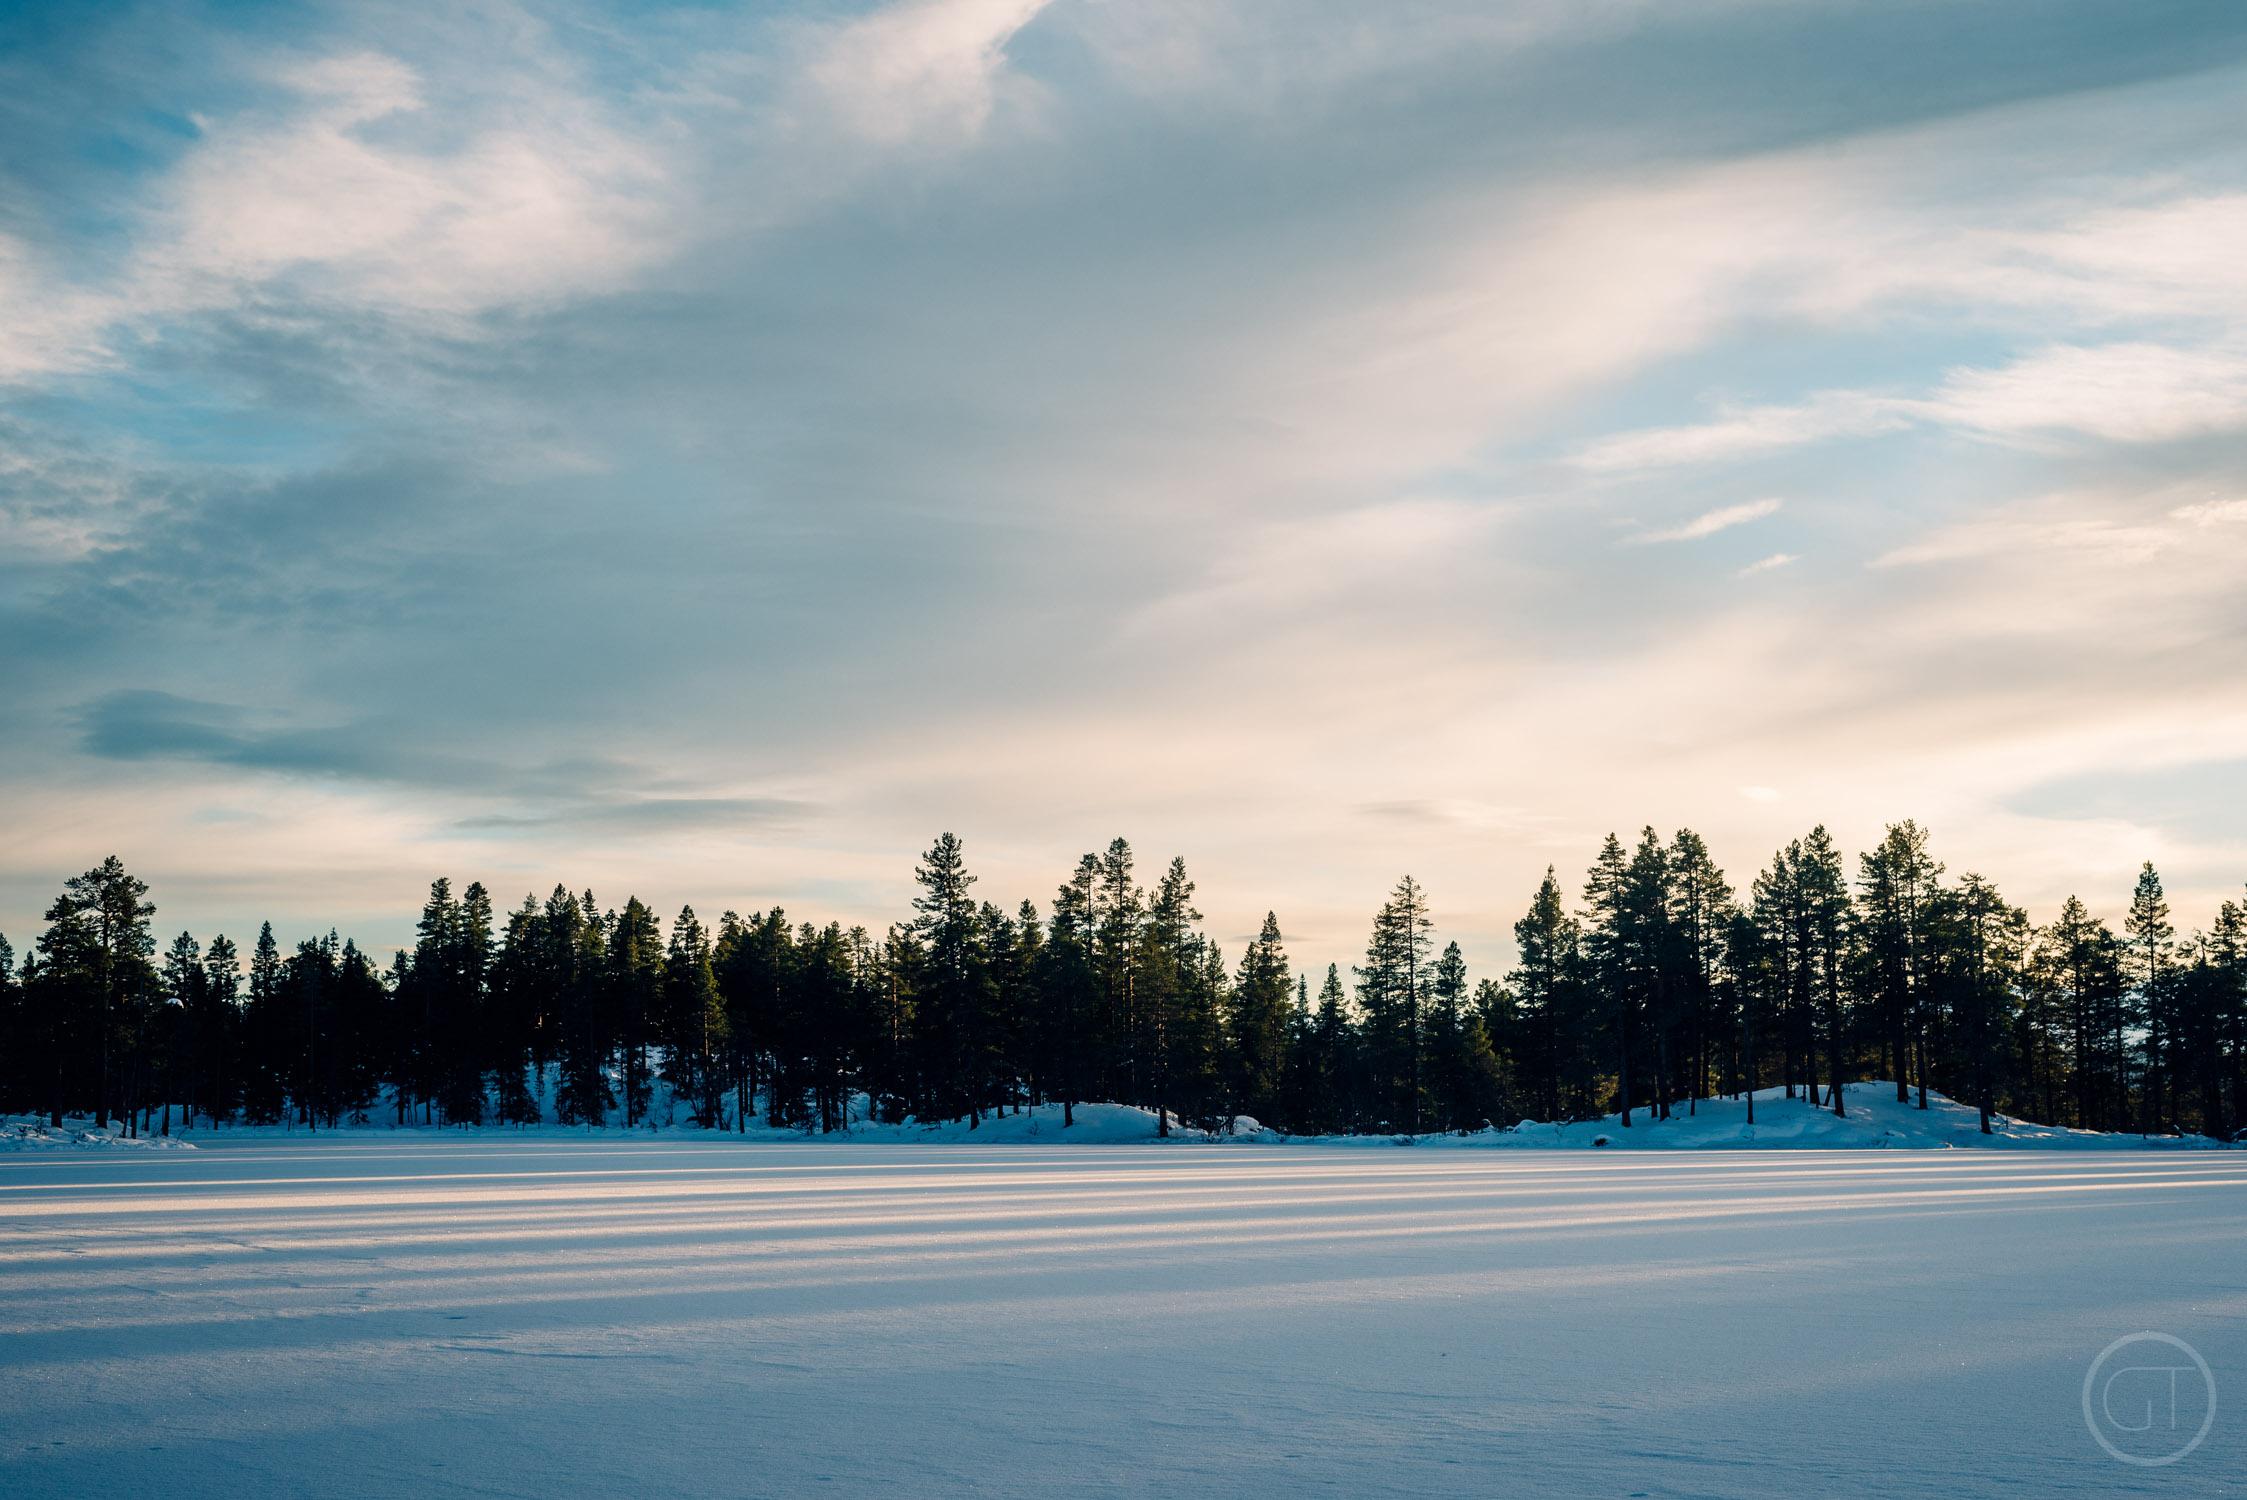 GUSTAV_THUESEN_HUNTING_NORWAY_OUTDOOR_LIFESTYLE_PHOTOGRAPHER_PROFESSIONAL-19.jpg